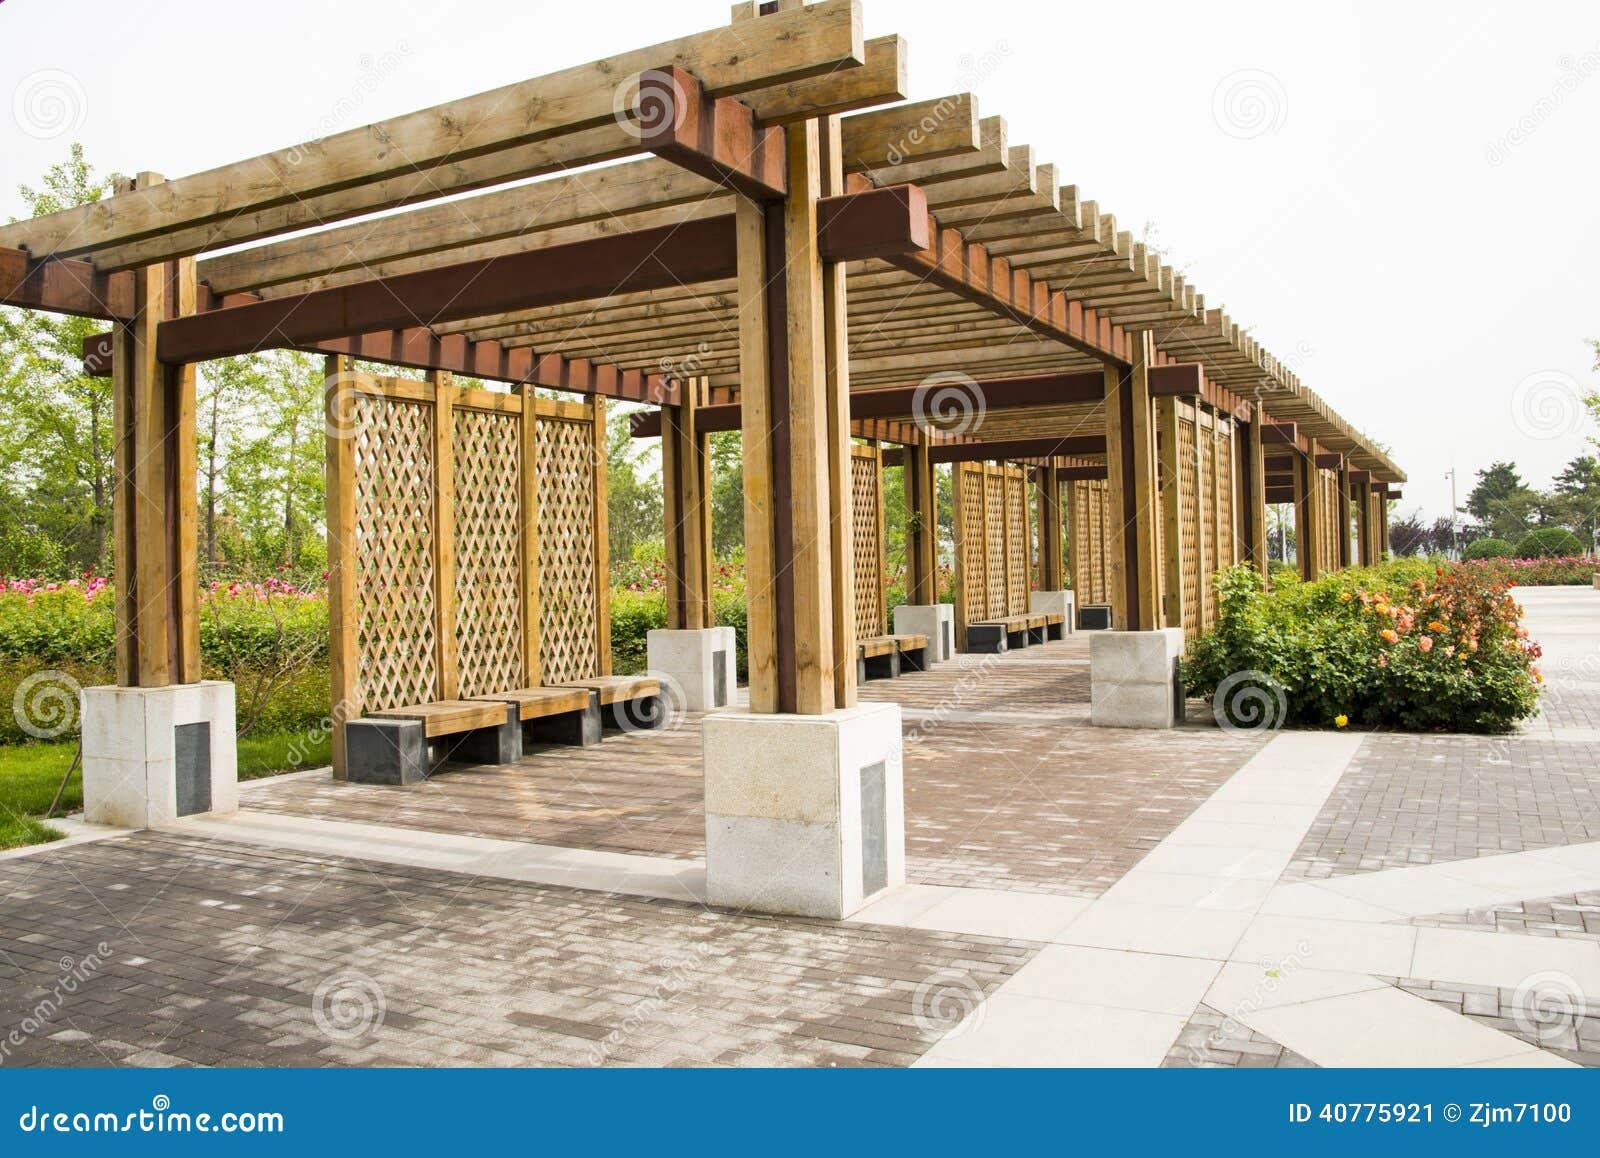 El Asiático China, Casa De Madera De La Estructura, Subió Imagen de ...